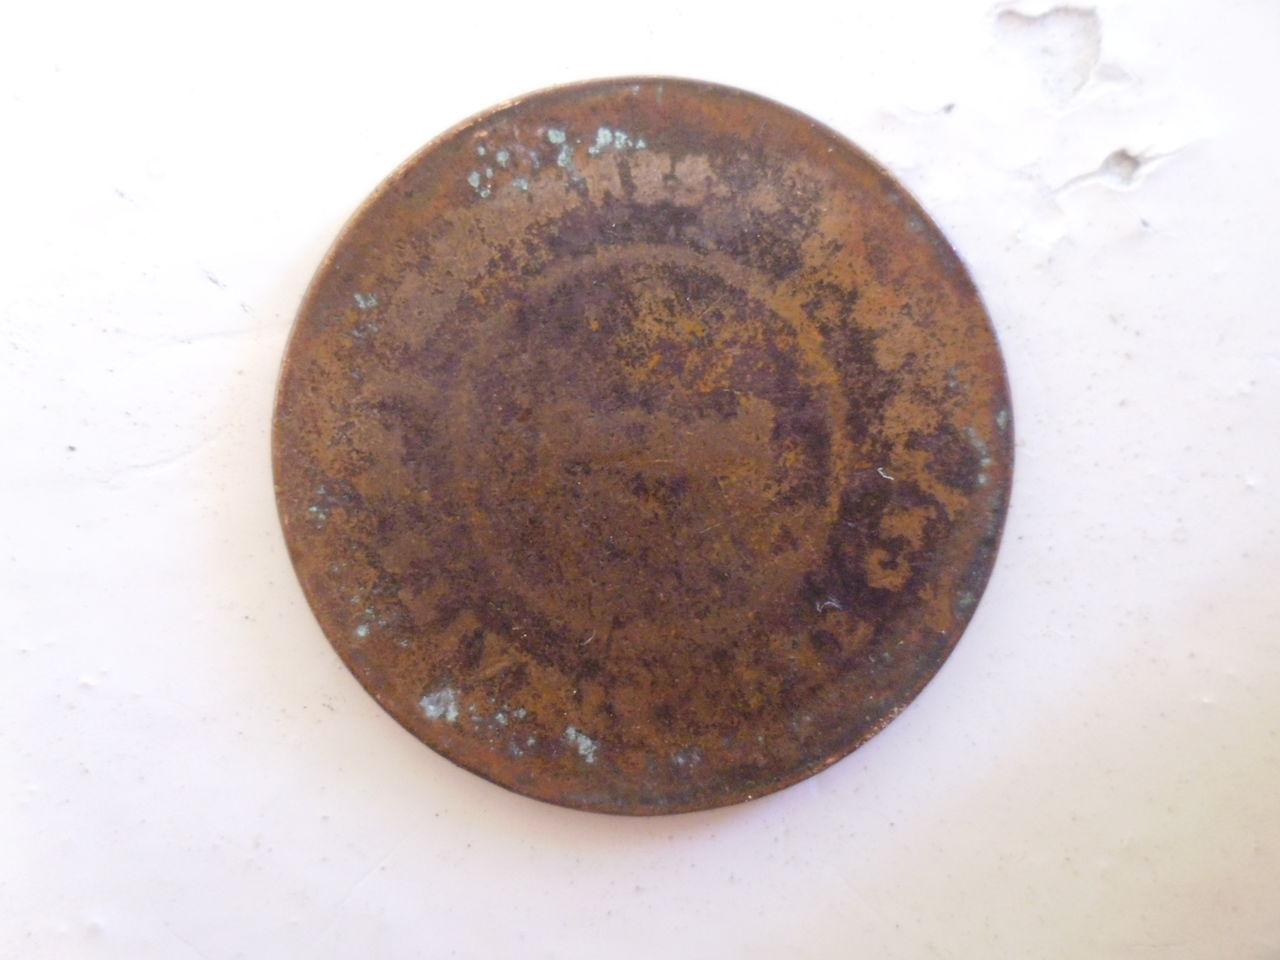 Moneda inglesa a identificar P1110688